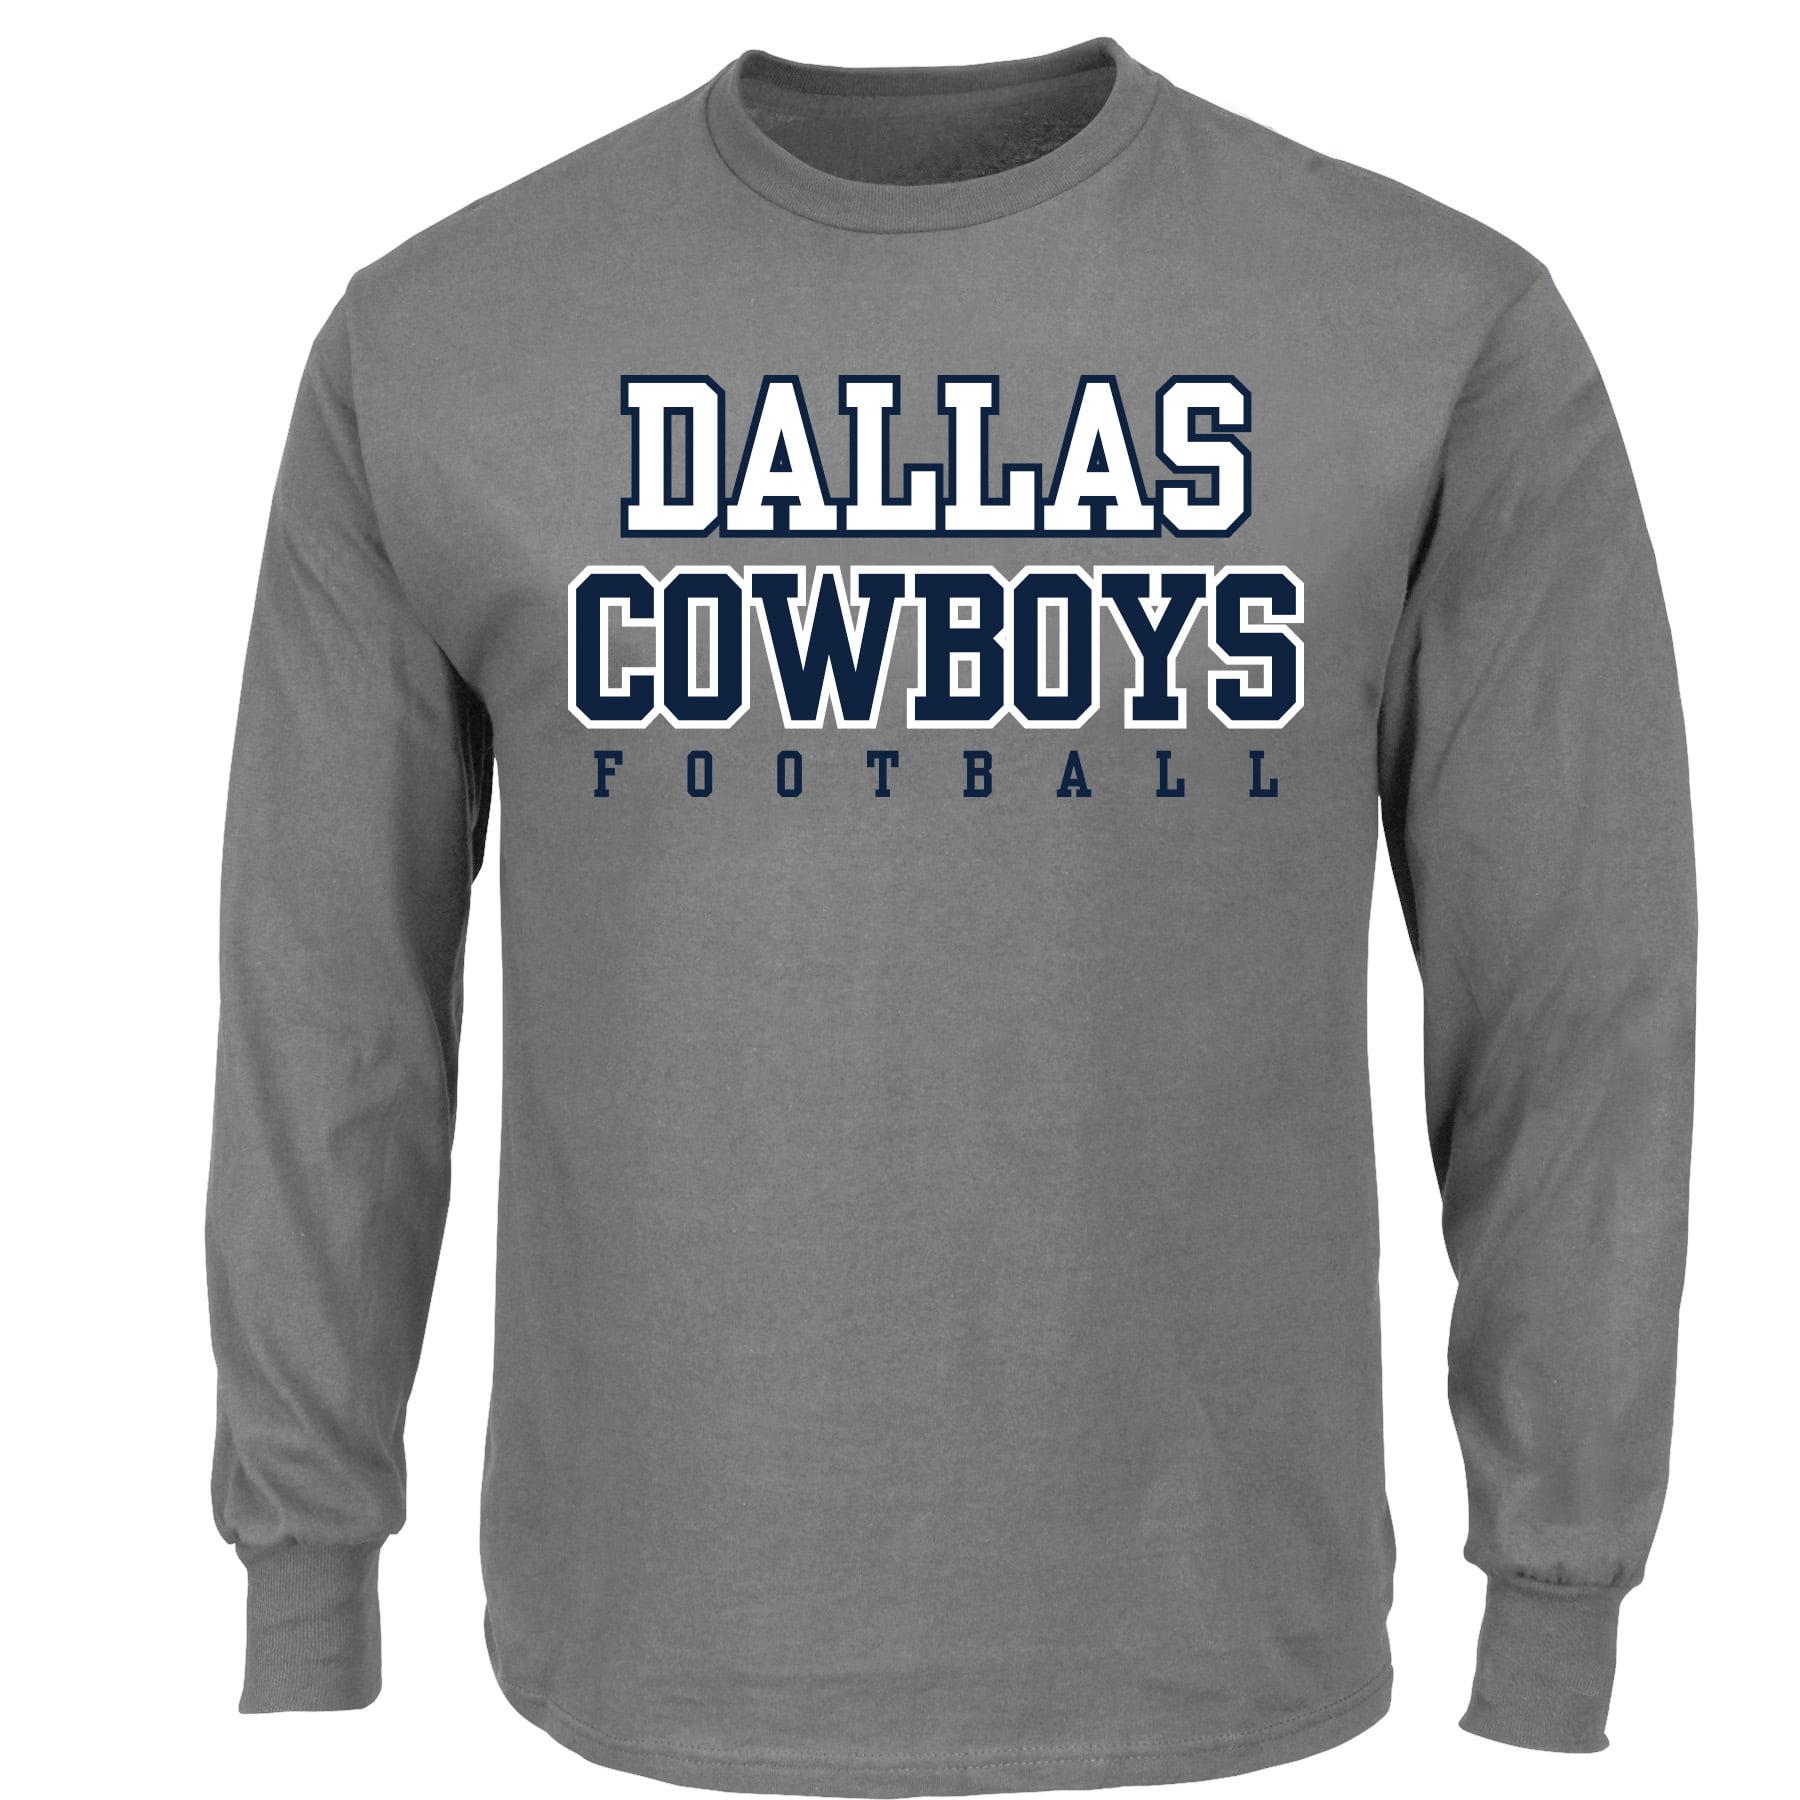 NFL Dallas Cowboys Men's Big and Tall Long Sleeve Tee